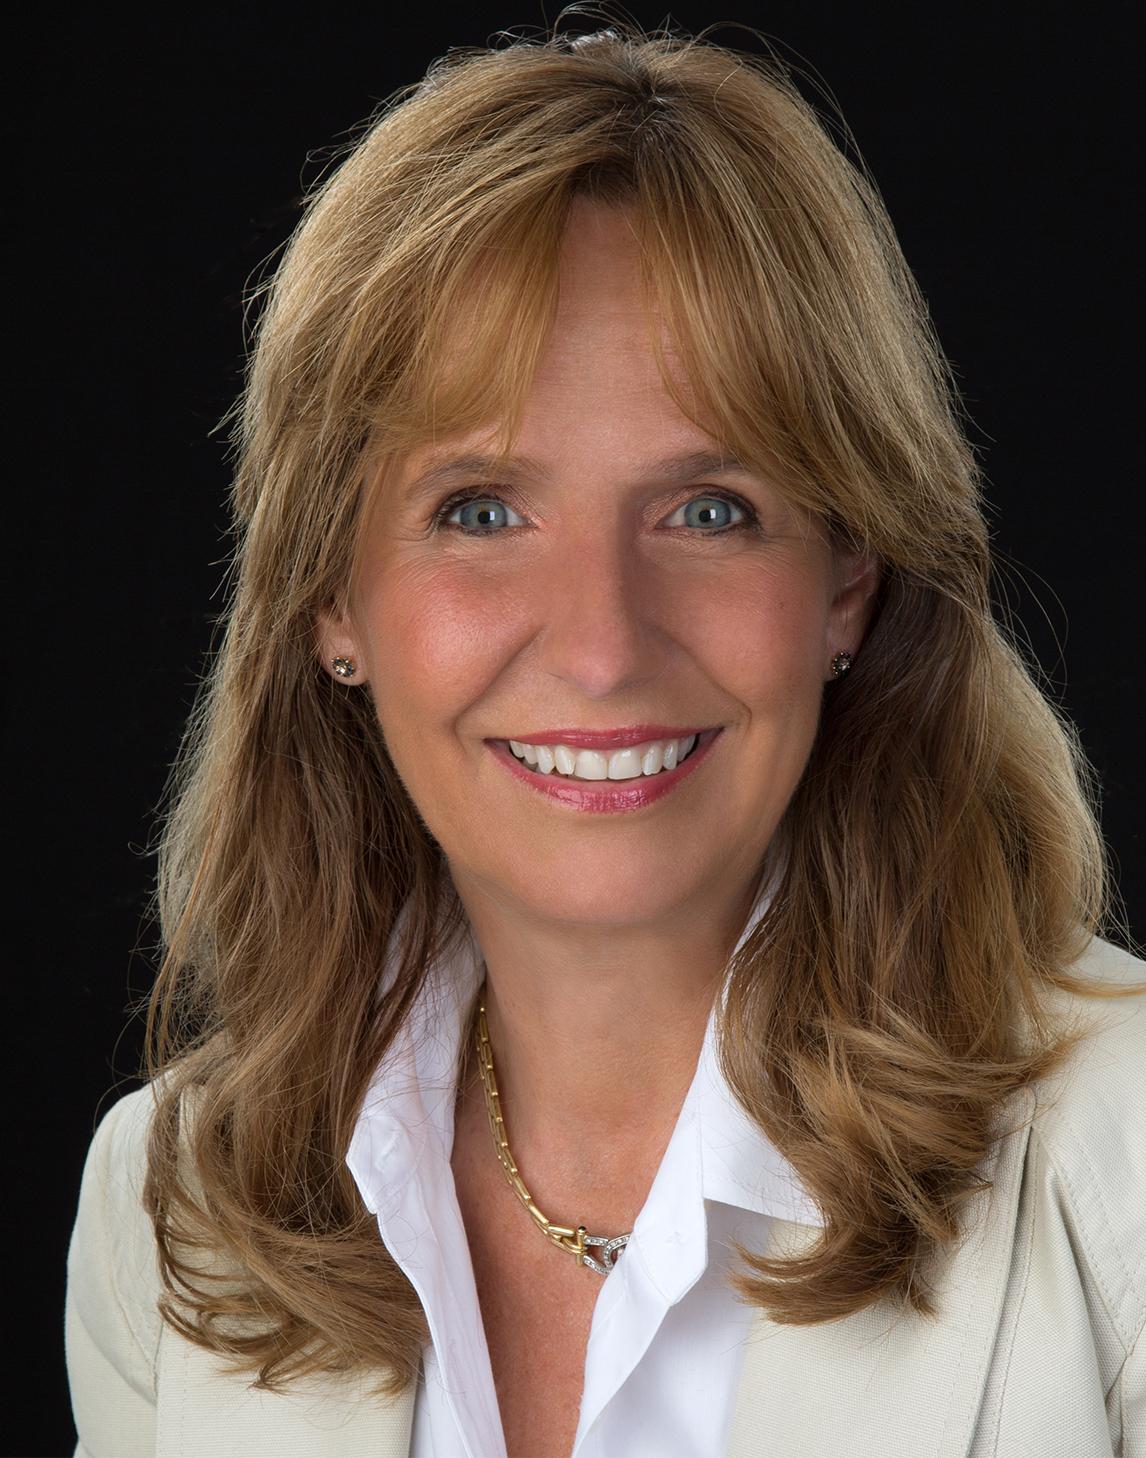 Sandra Hachmann-Simic